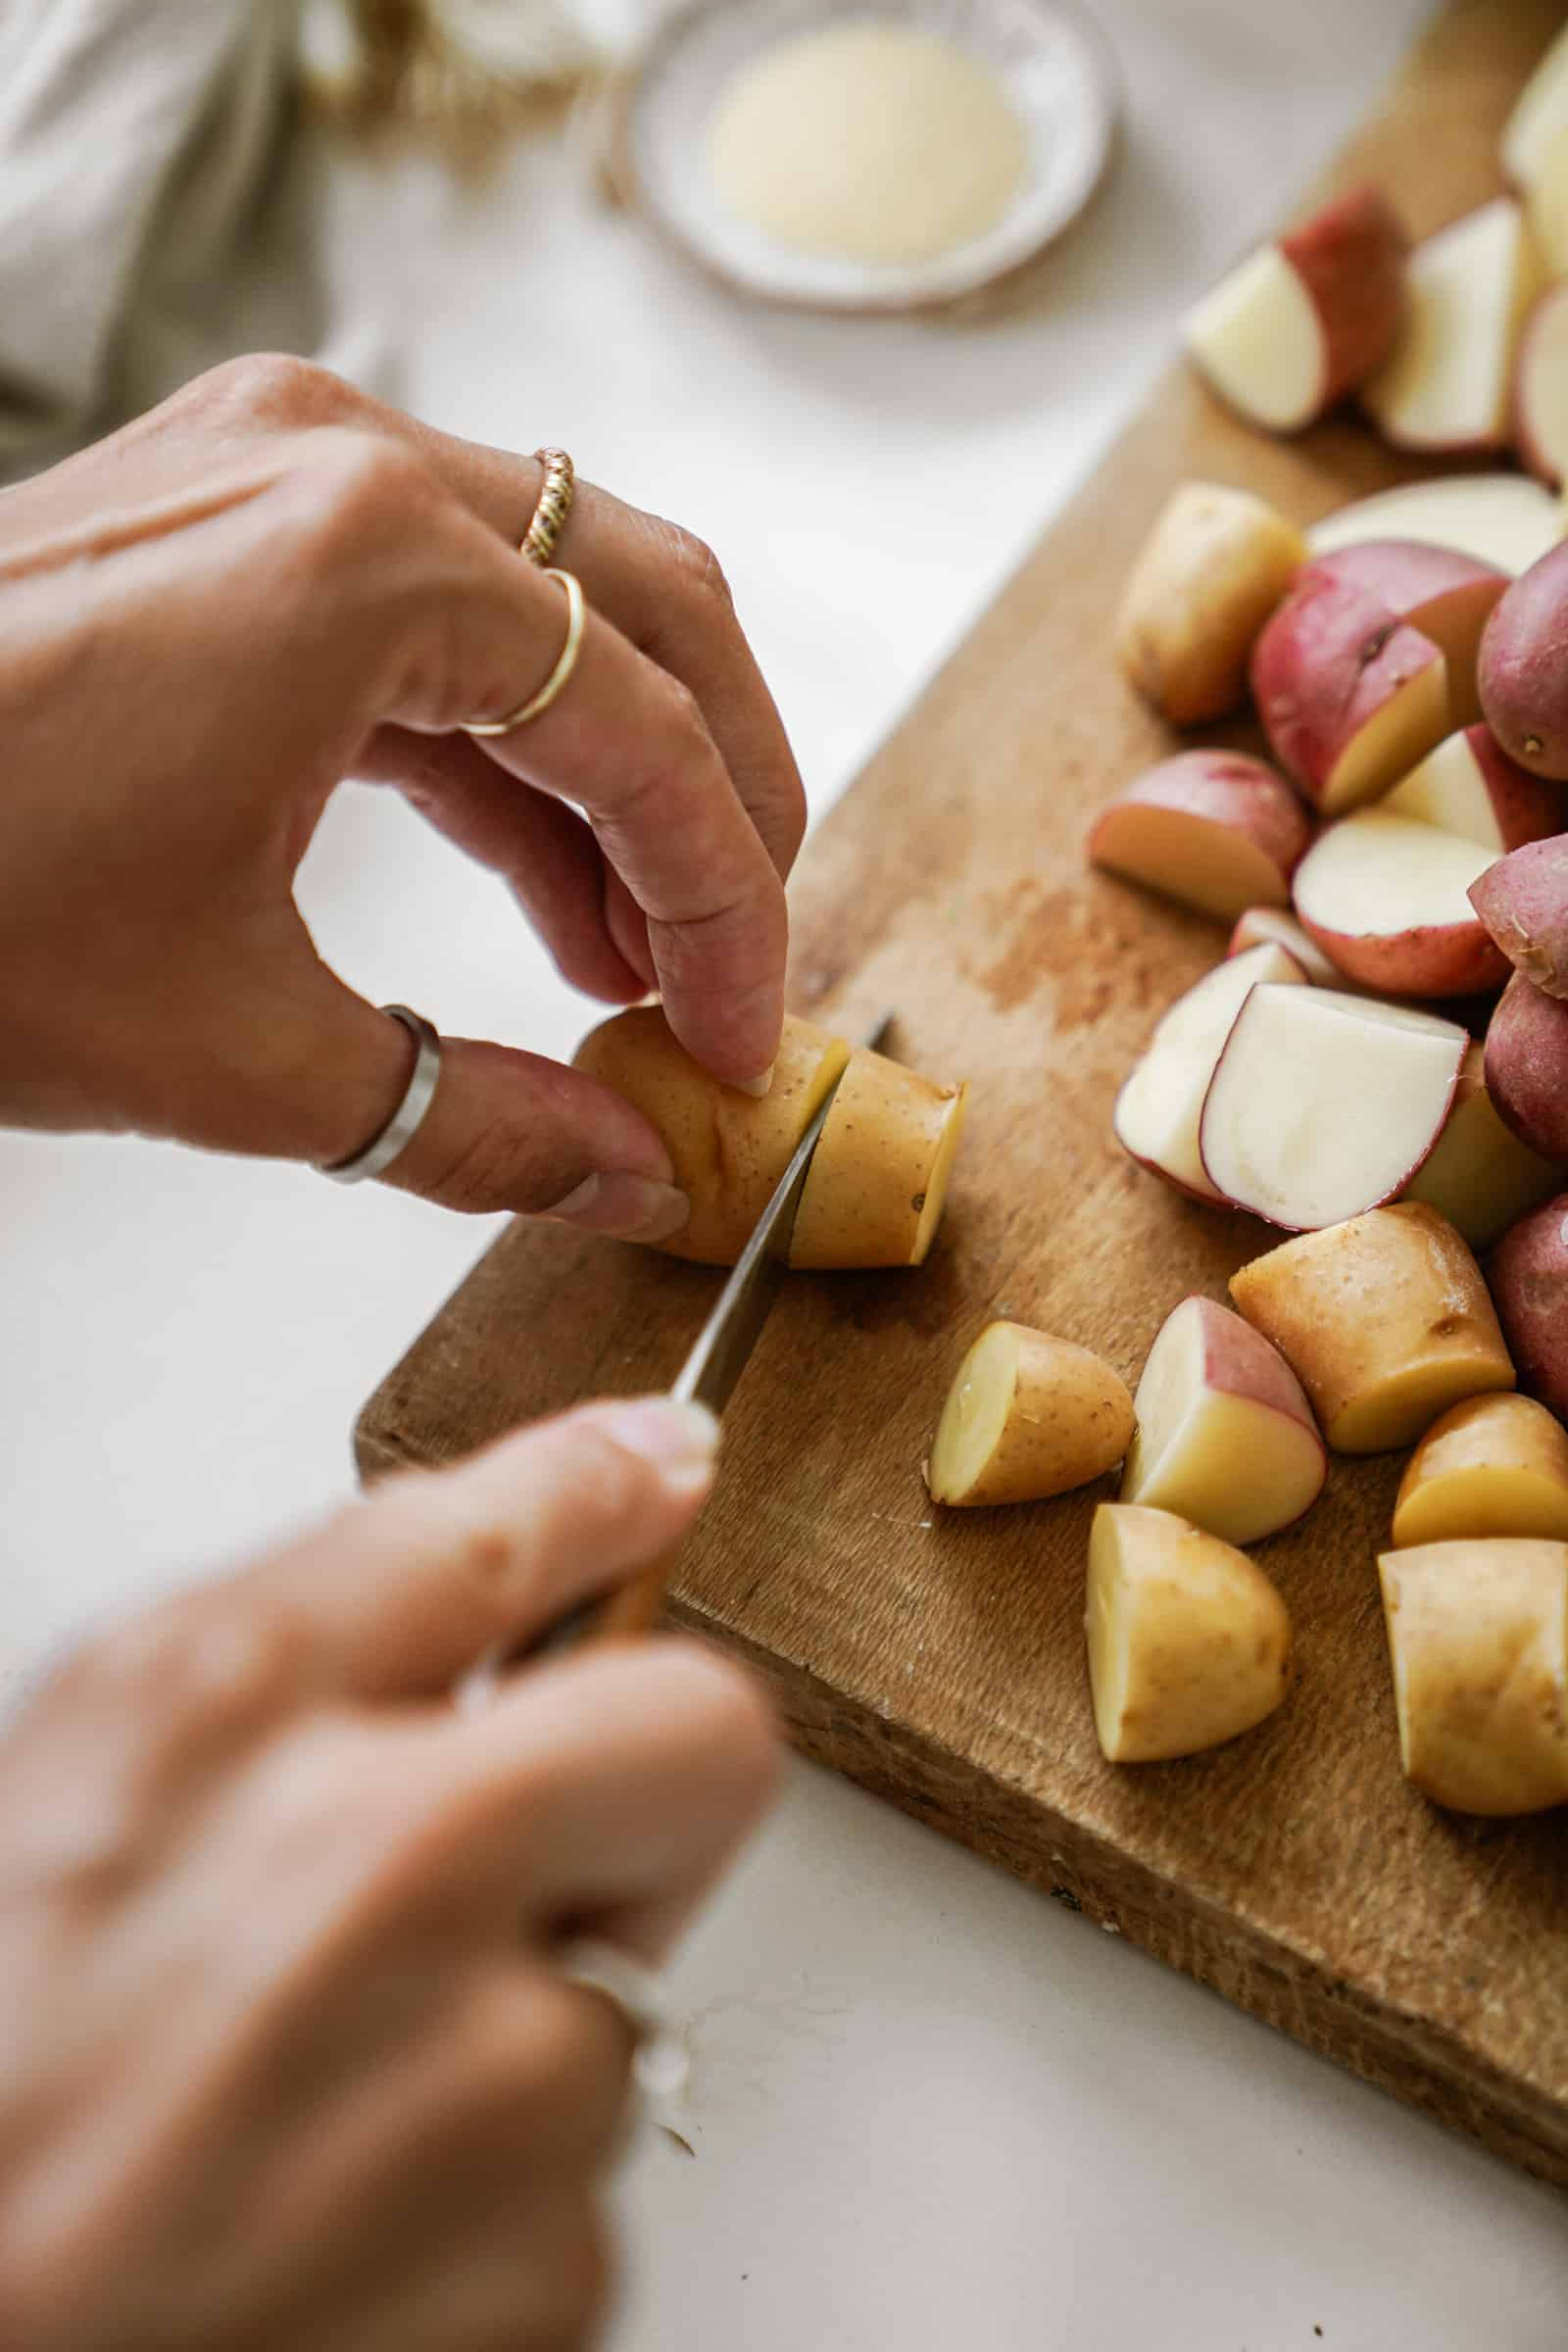 Hang cutting potatoes for Greek Potato Salad